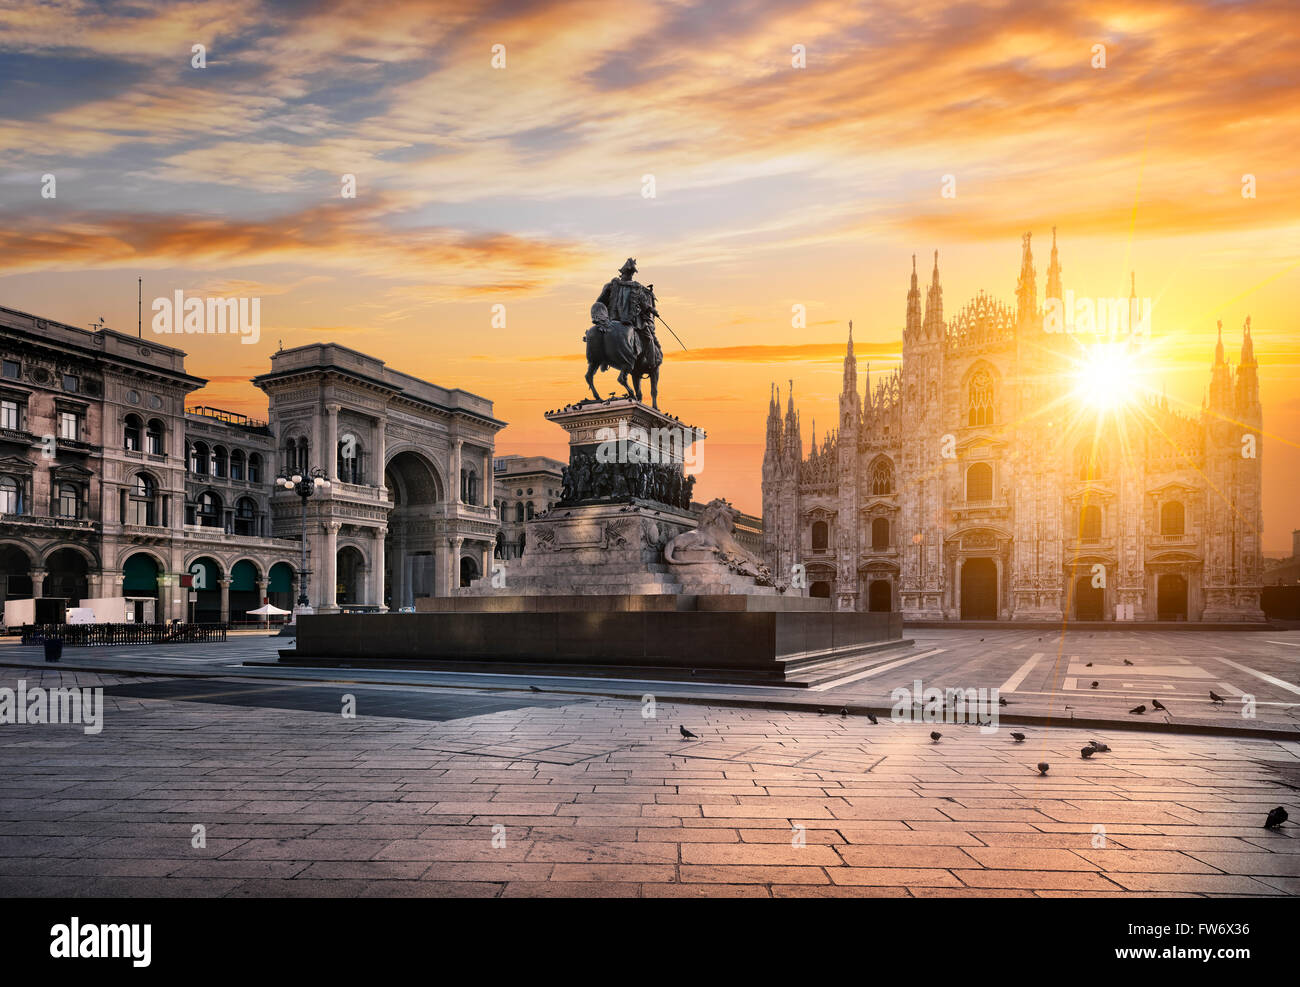 Dom bei Sonnenaufgang, Mailand, Italien, Europa. Stockbild